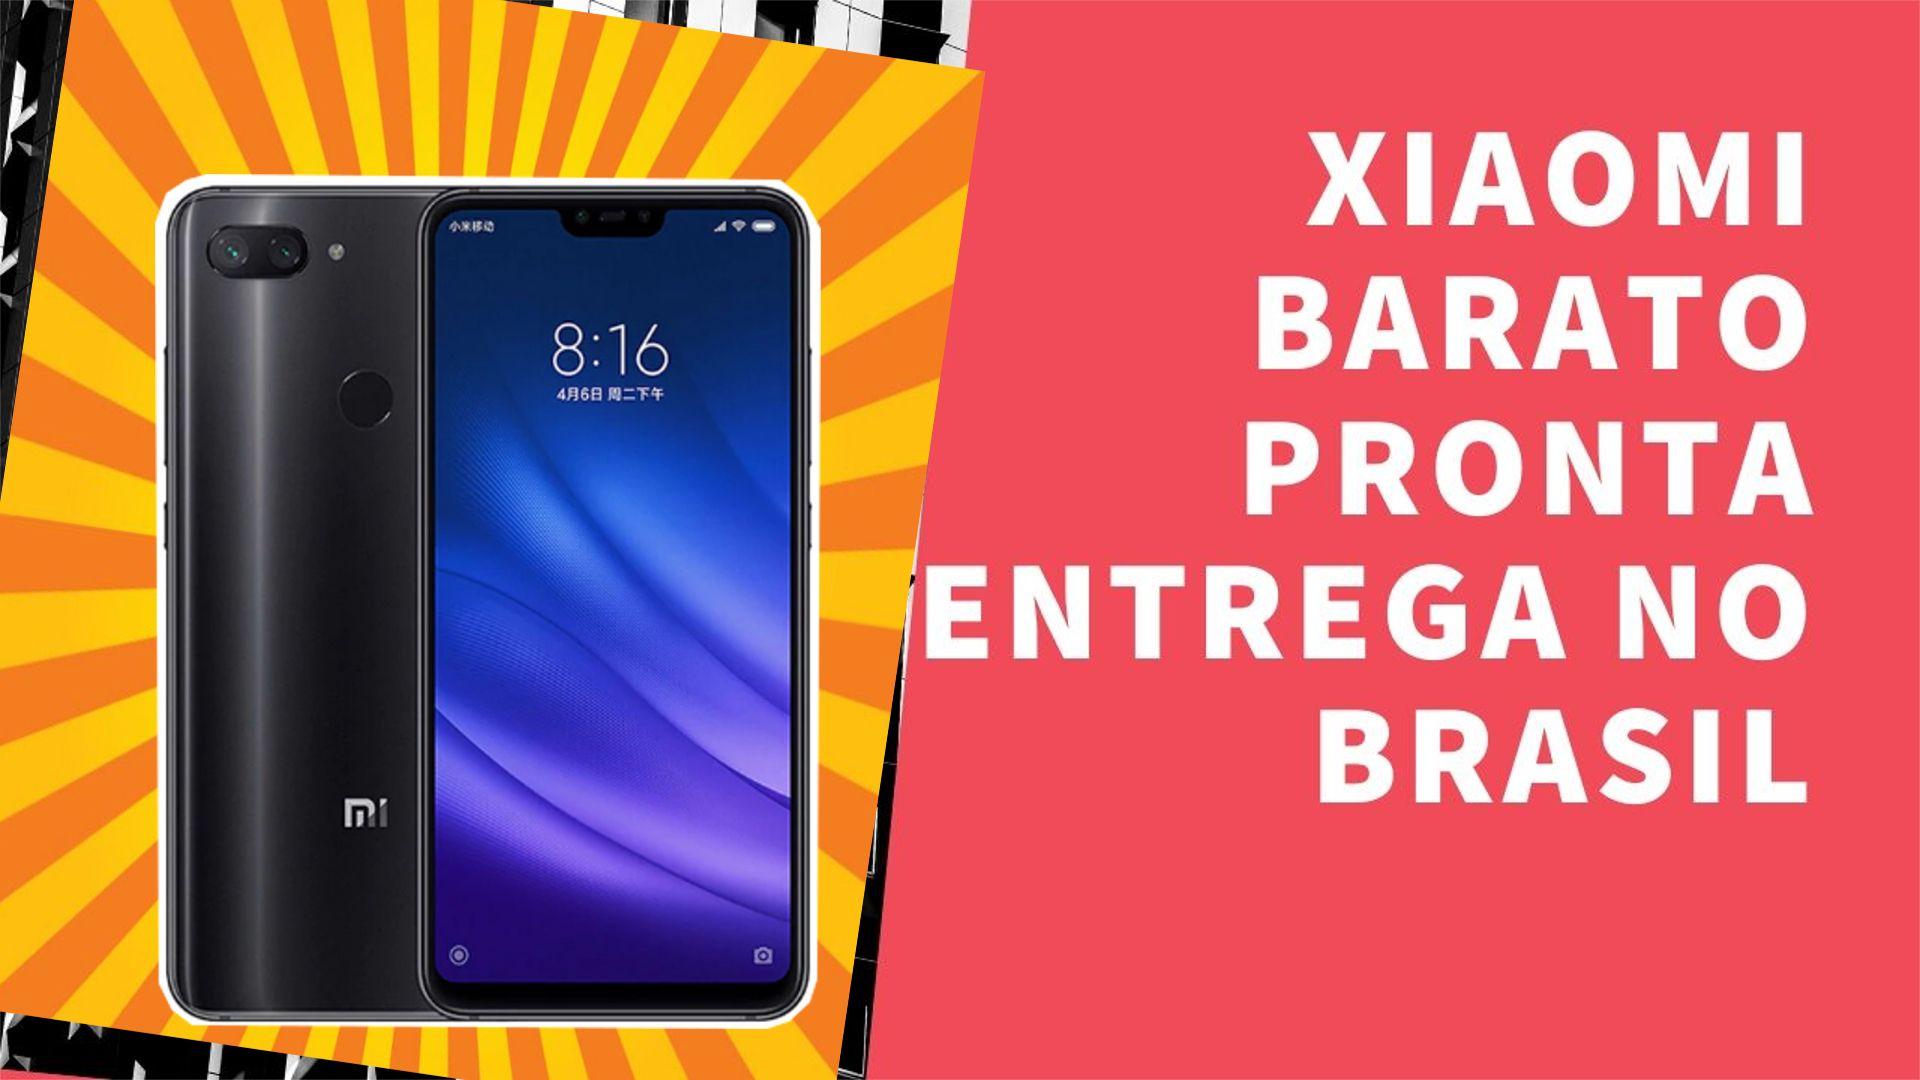 Xiaomi Mi8 Barato Com Pronta Entrega No Brasil Comprar Celular Celular Brasil